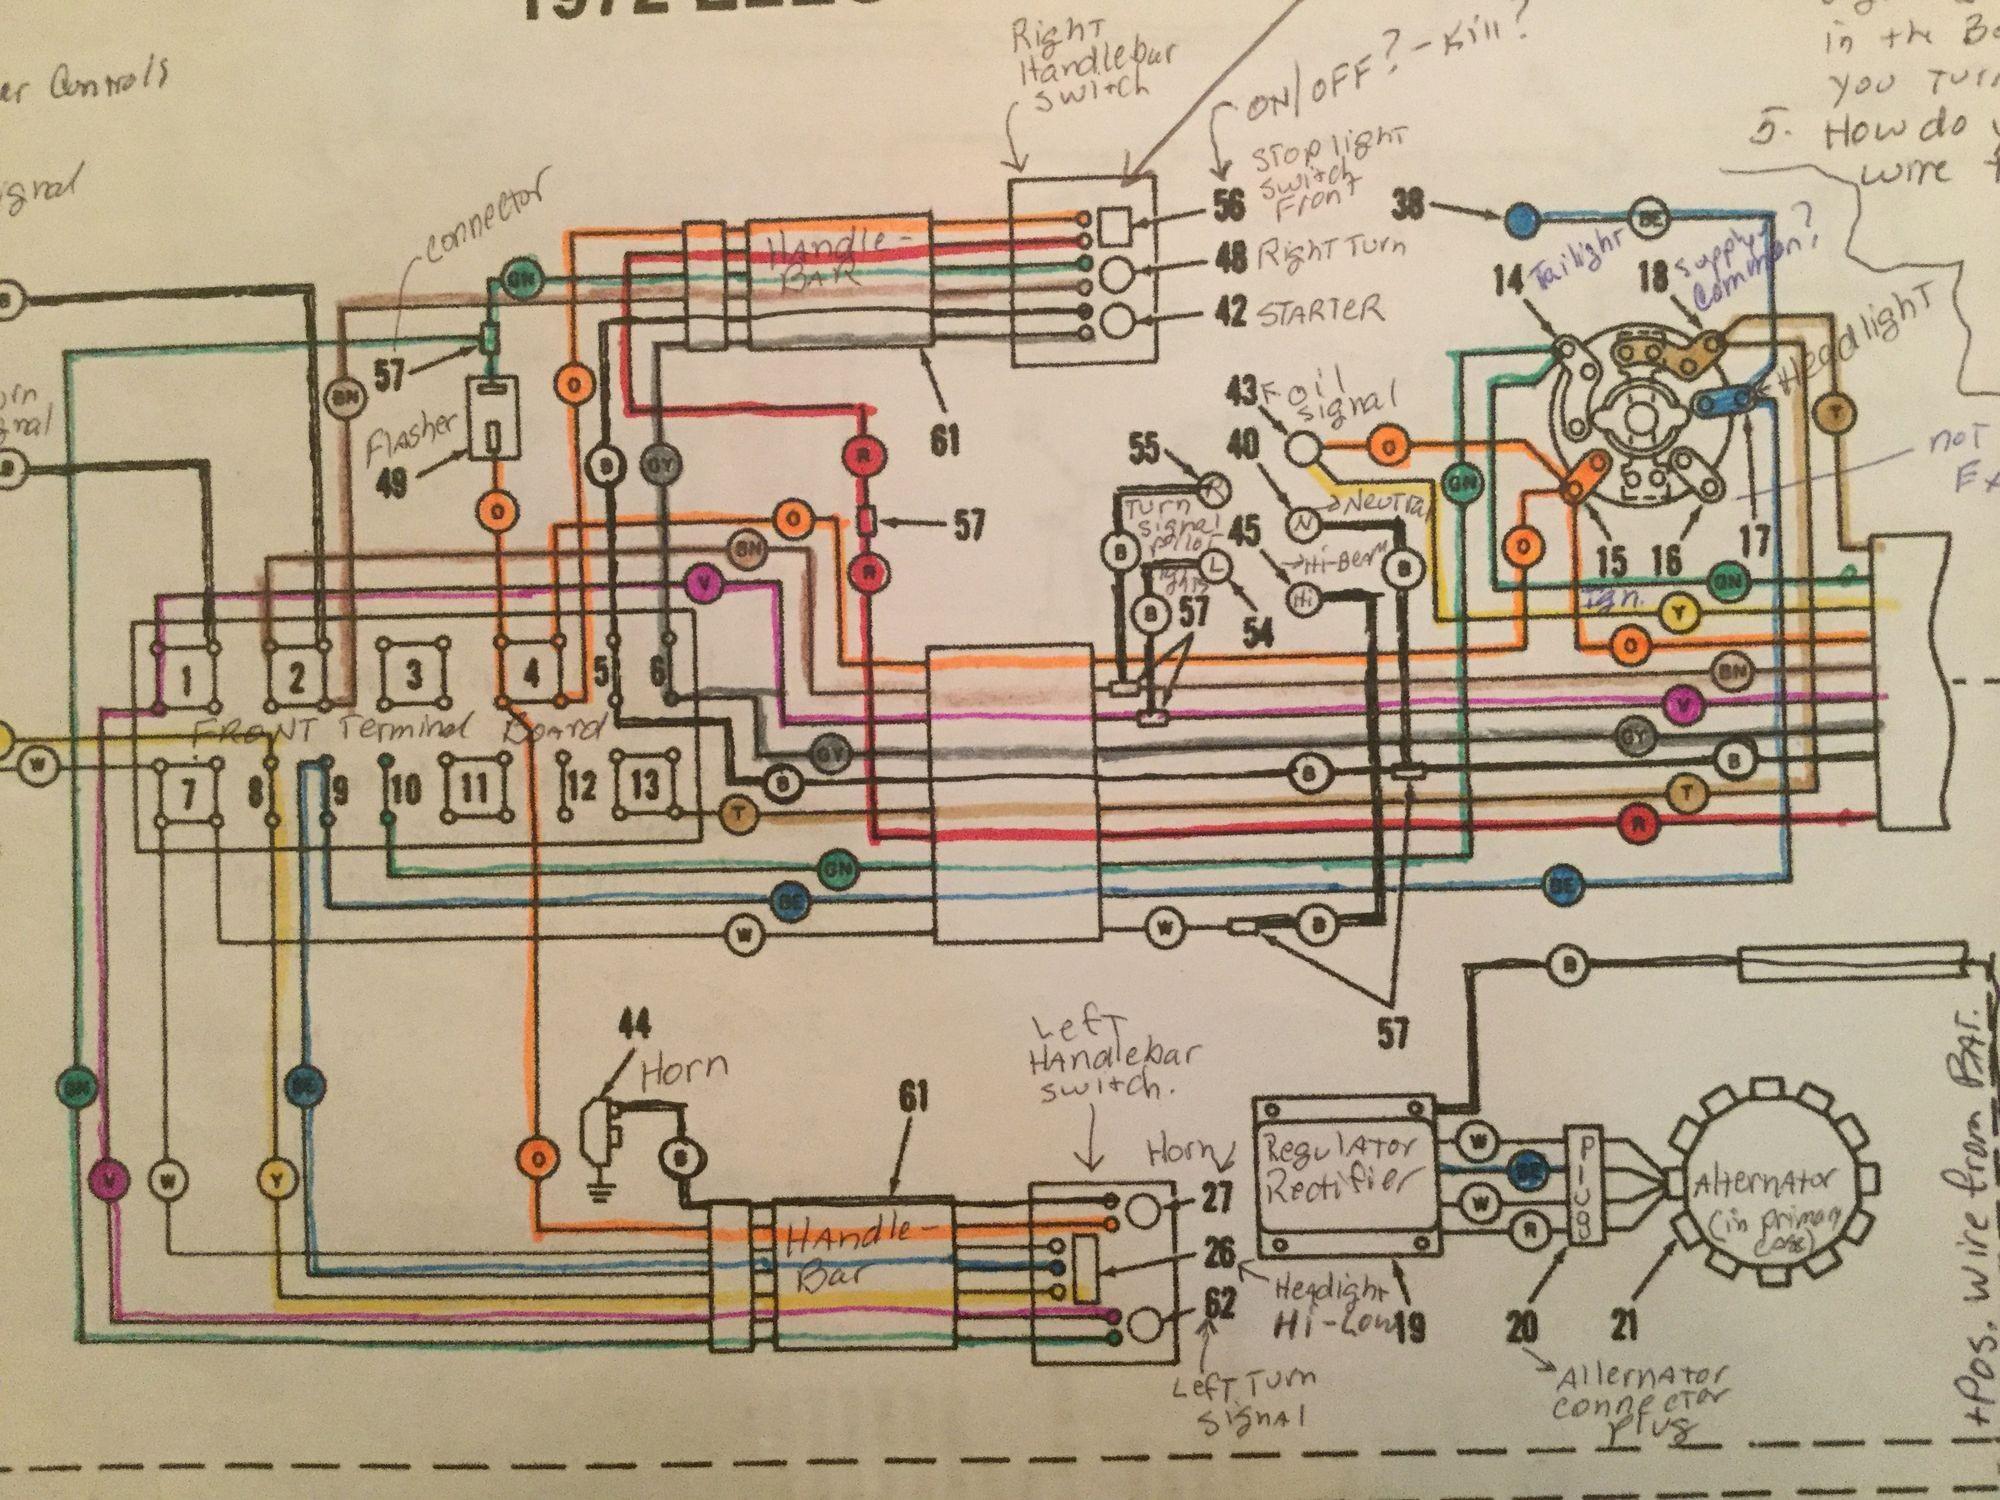 1970 Harley Shovelhead Wiring Schematic Diagram] 1973 Flh Wiring Diagram Dash Full Version Hd Of 1970 Harley Shovelhead Wiring Schematic